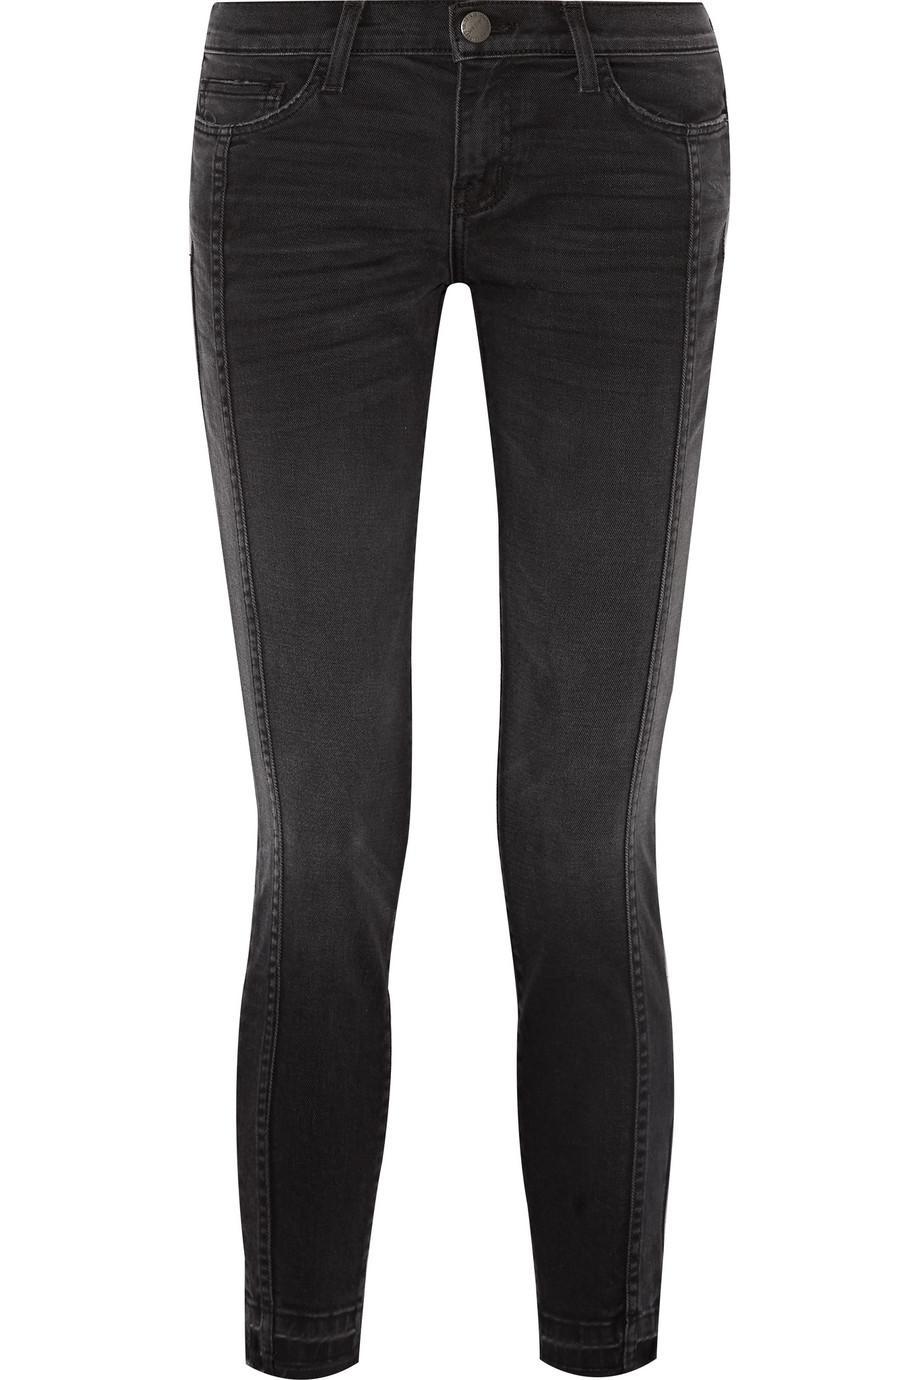 The Seamed Easy Stiletto Mid-rise Stretch-denim Skinny Jeans - Black Current Elliott 1REmJ77l